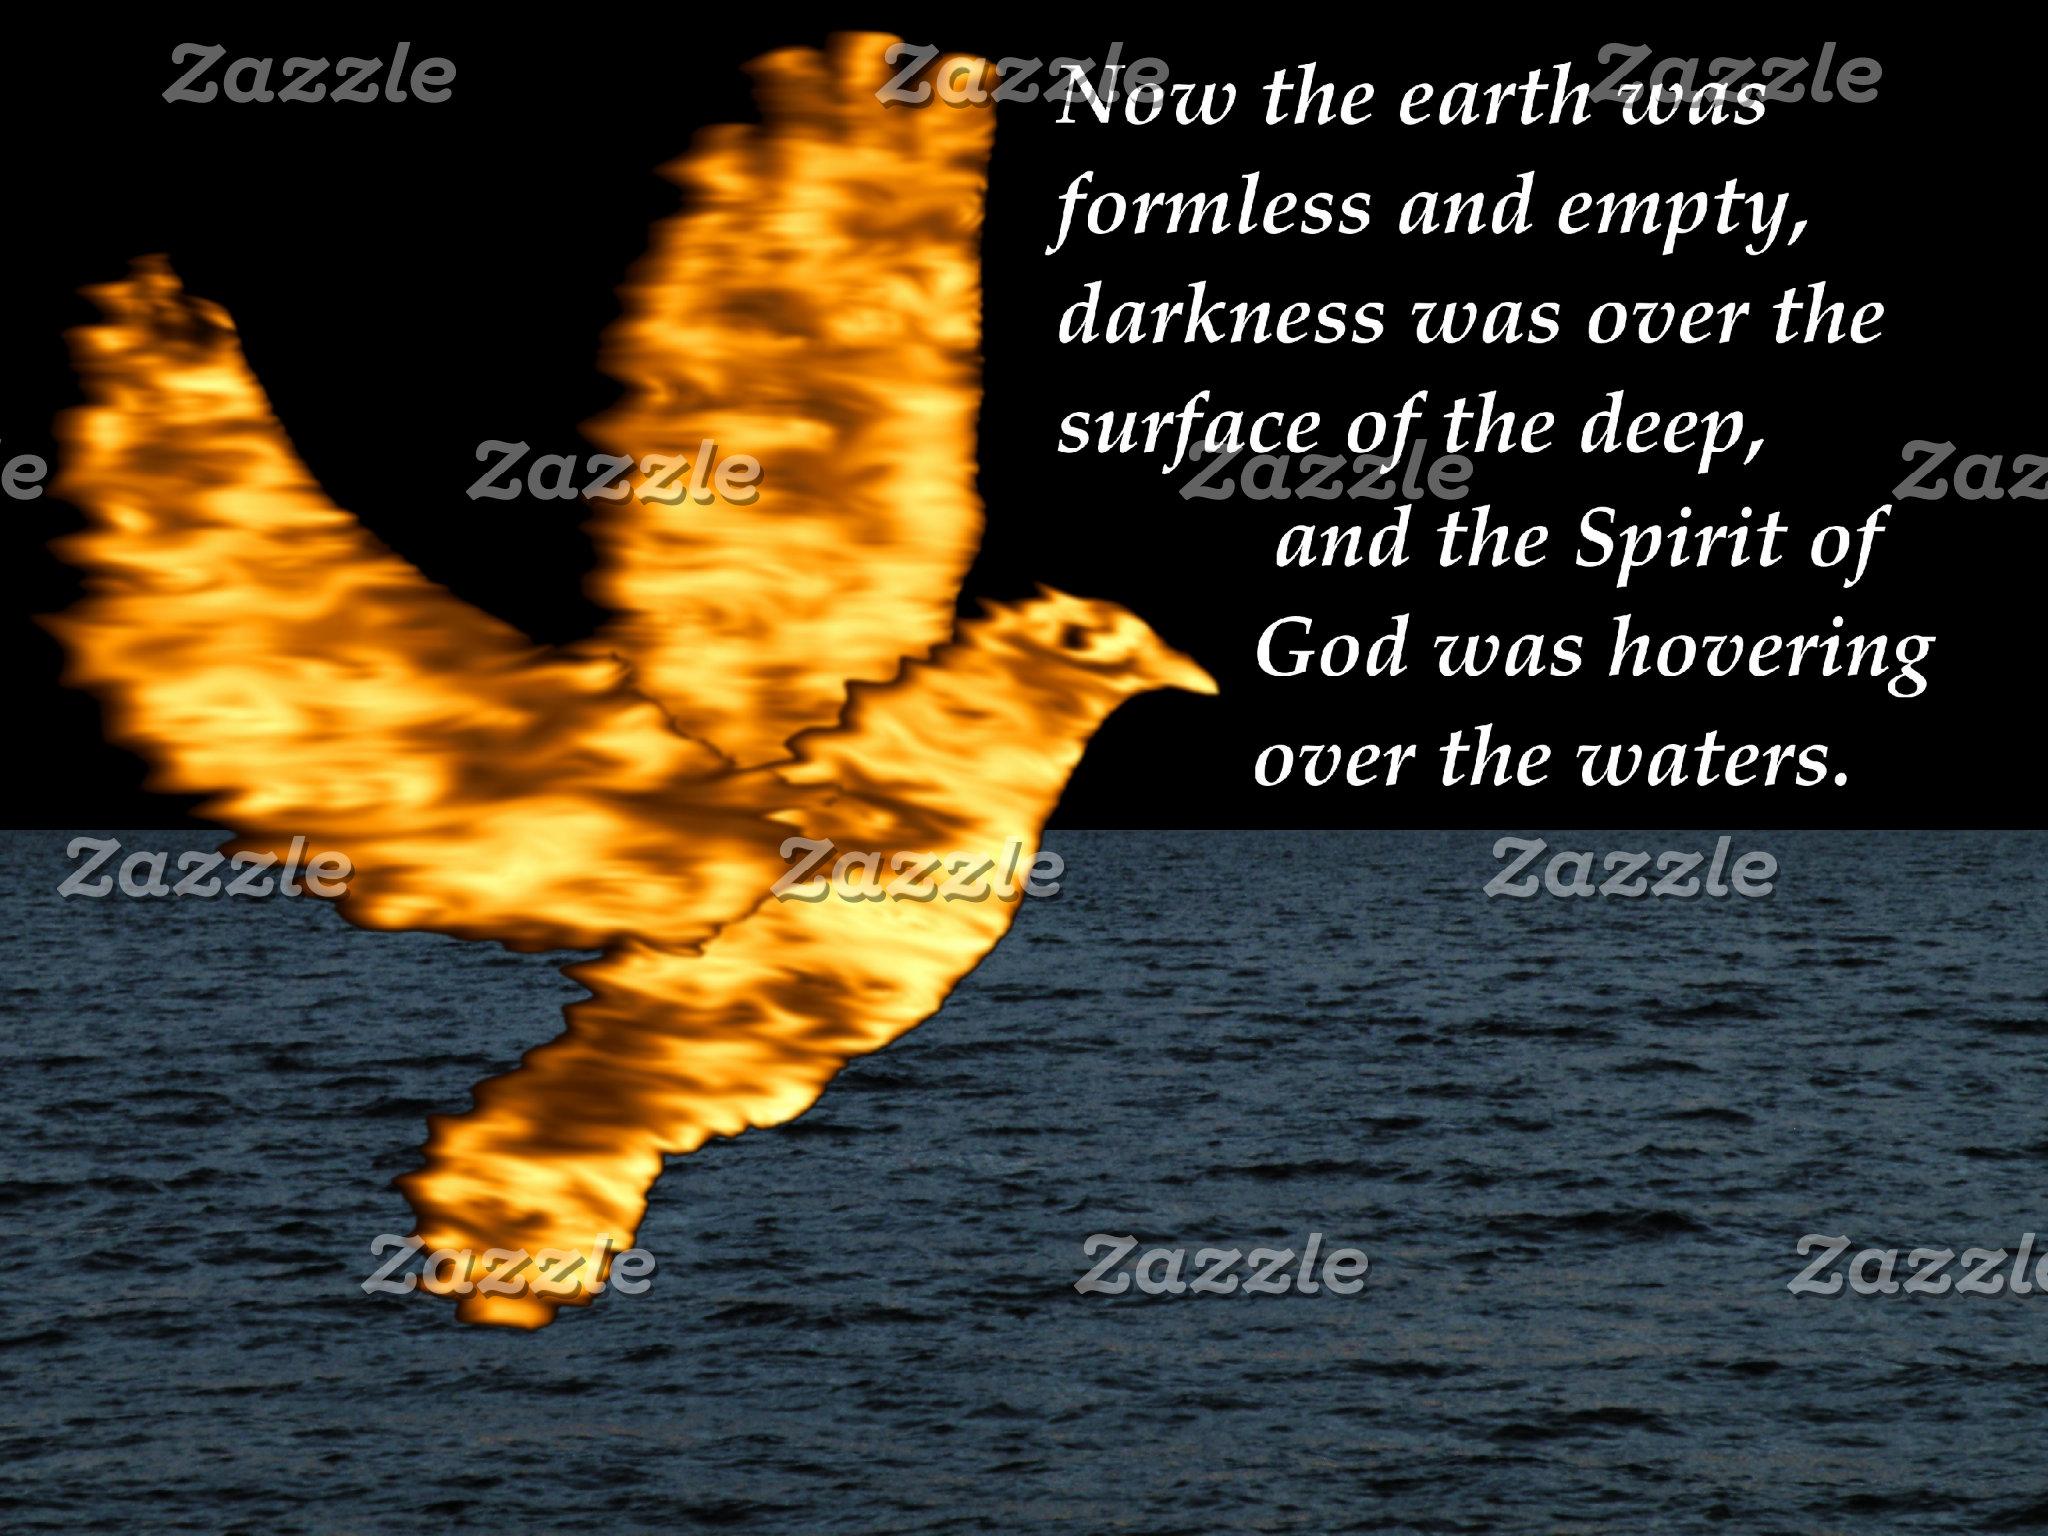 Holy Spirit Dove - The Creation